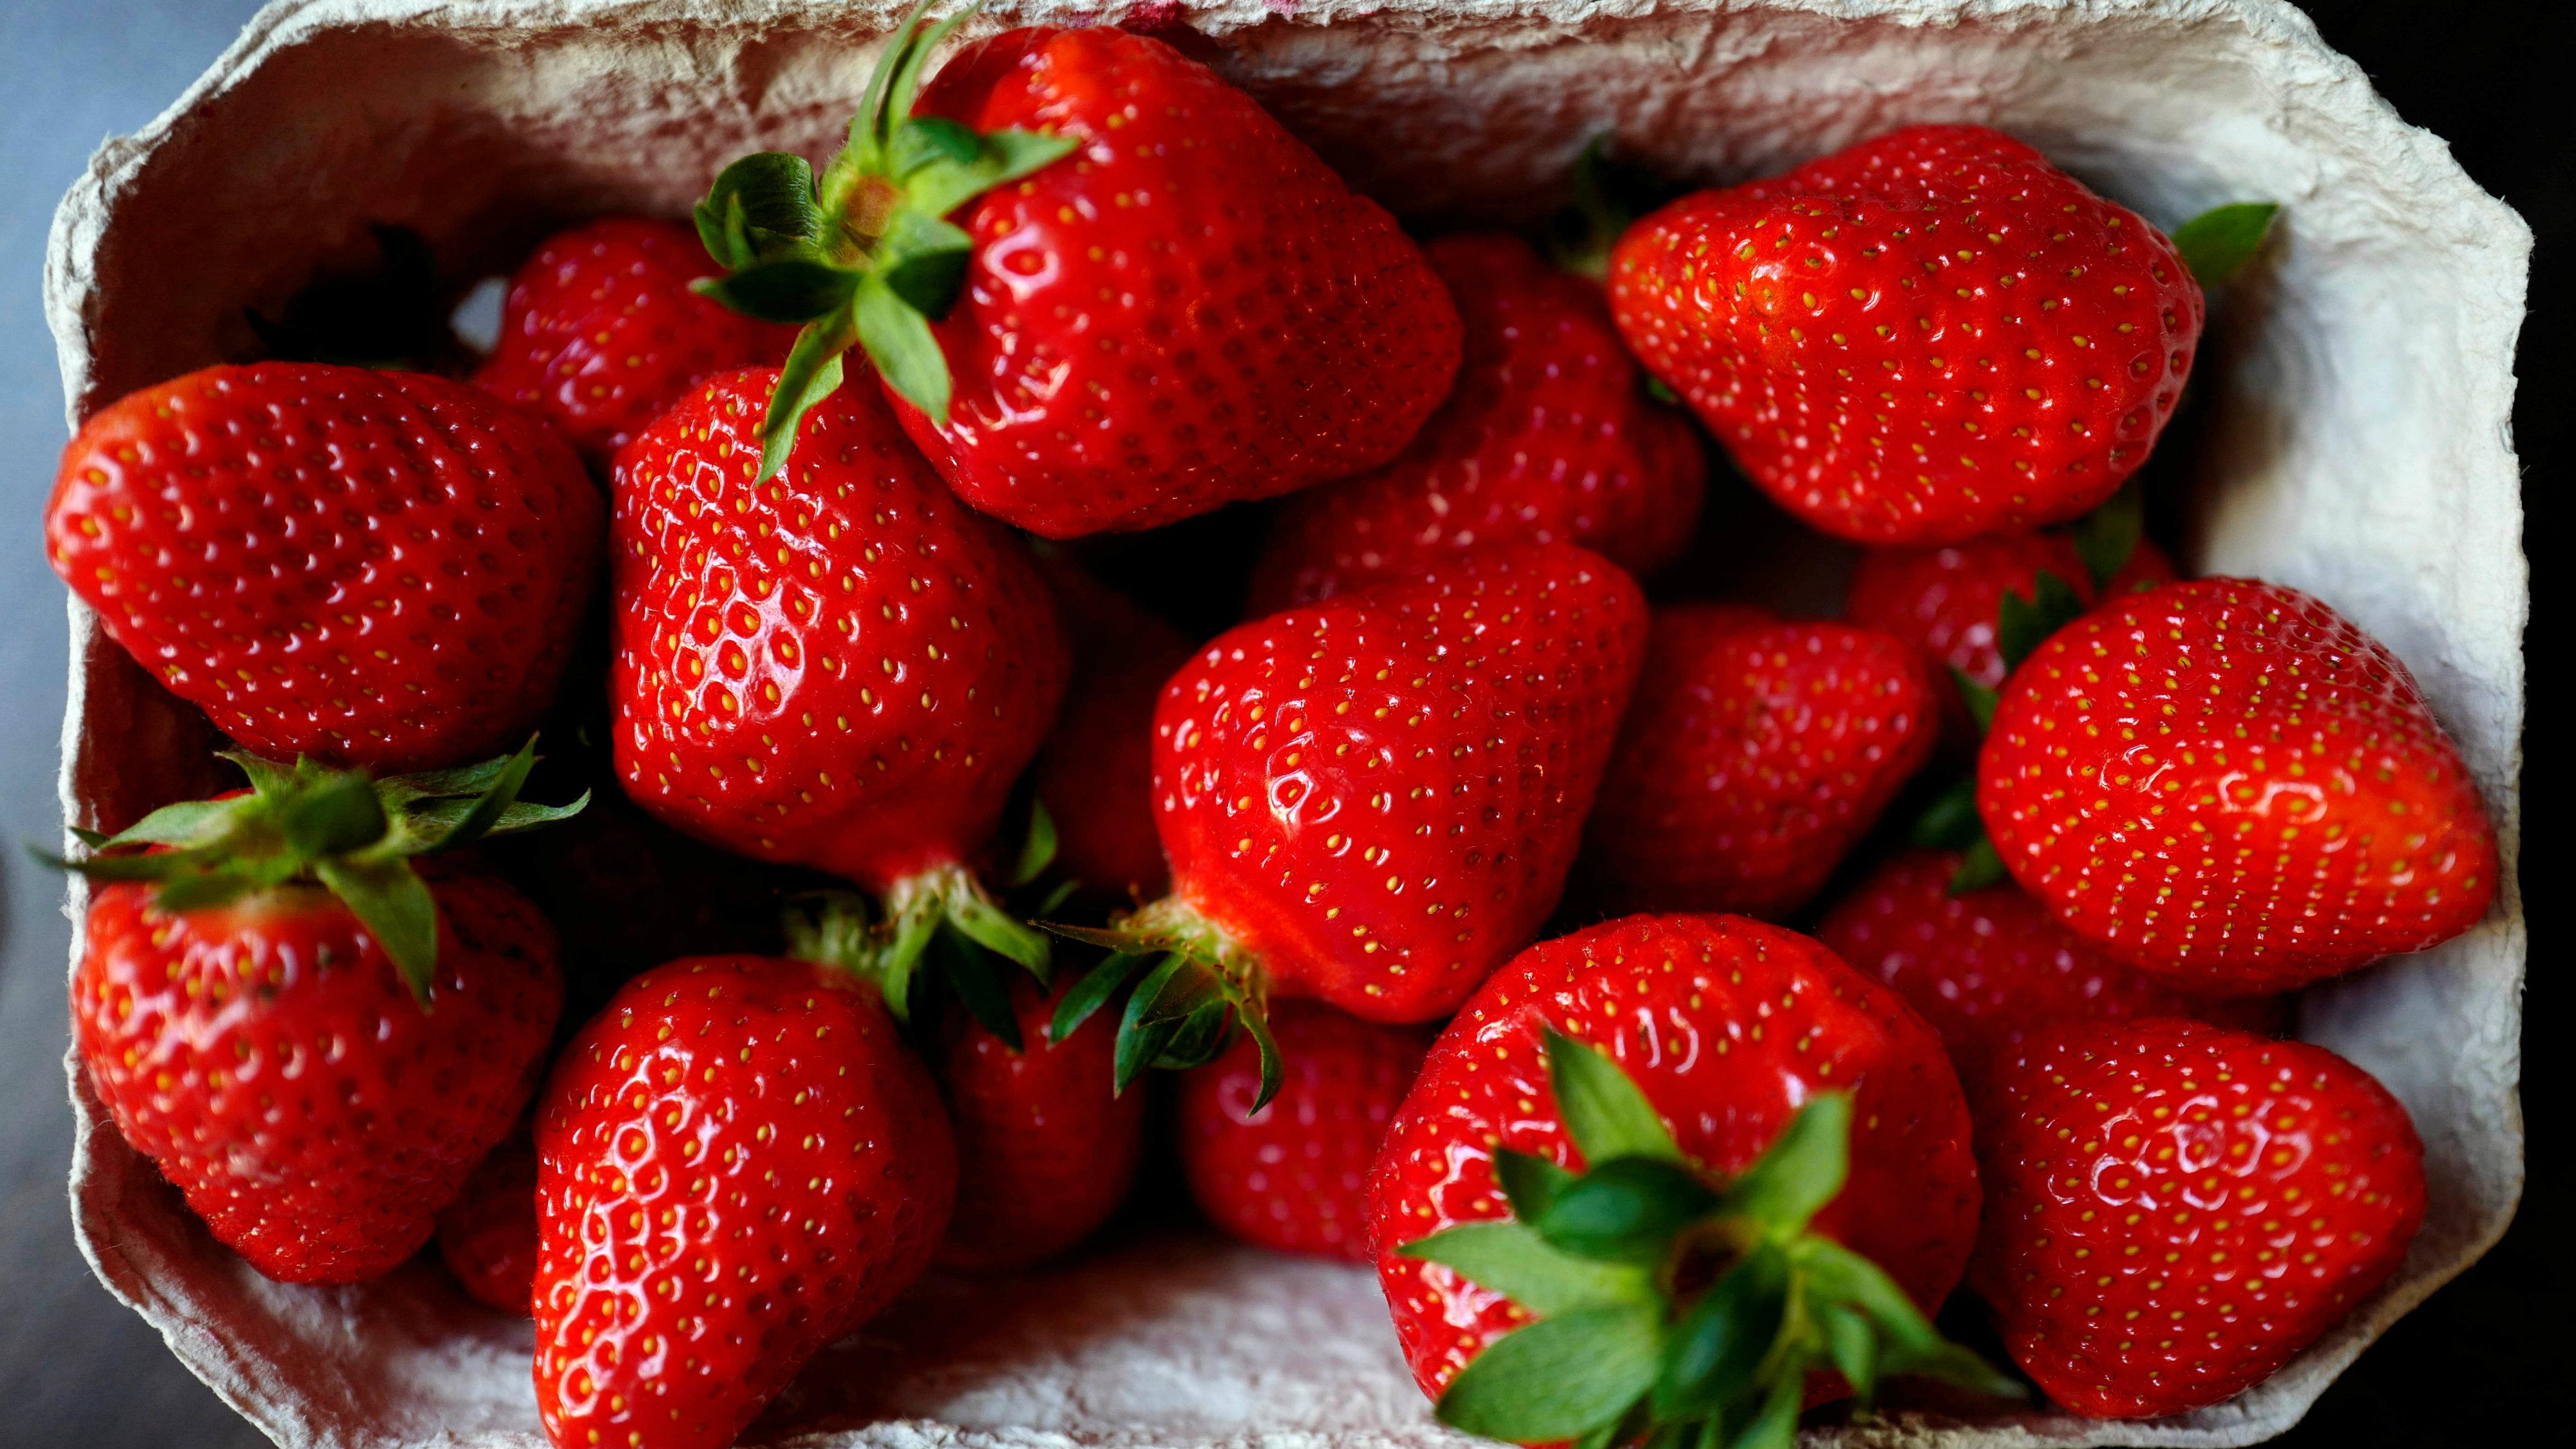 A cardboard punnet full of freshly picked strawberries